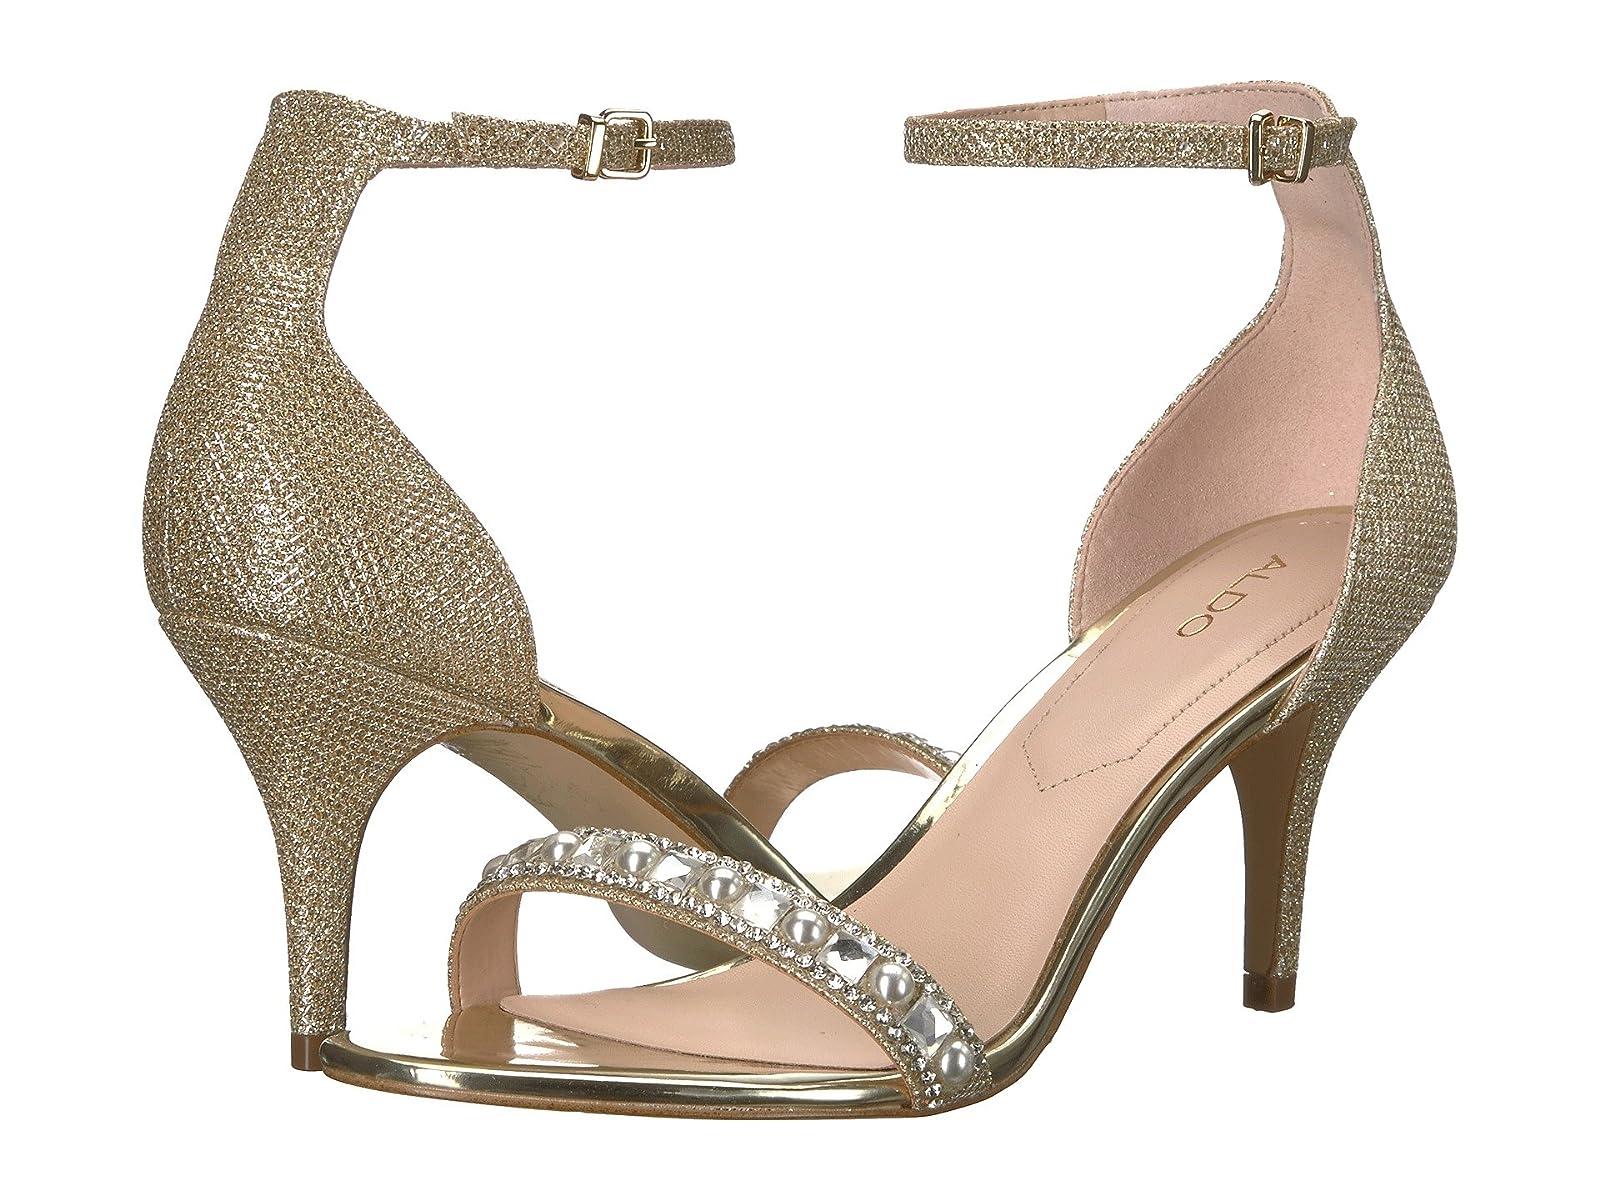 ALDO SassocorvaroCheap and distinctive eye-catching shoes